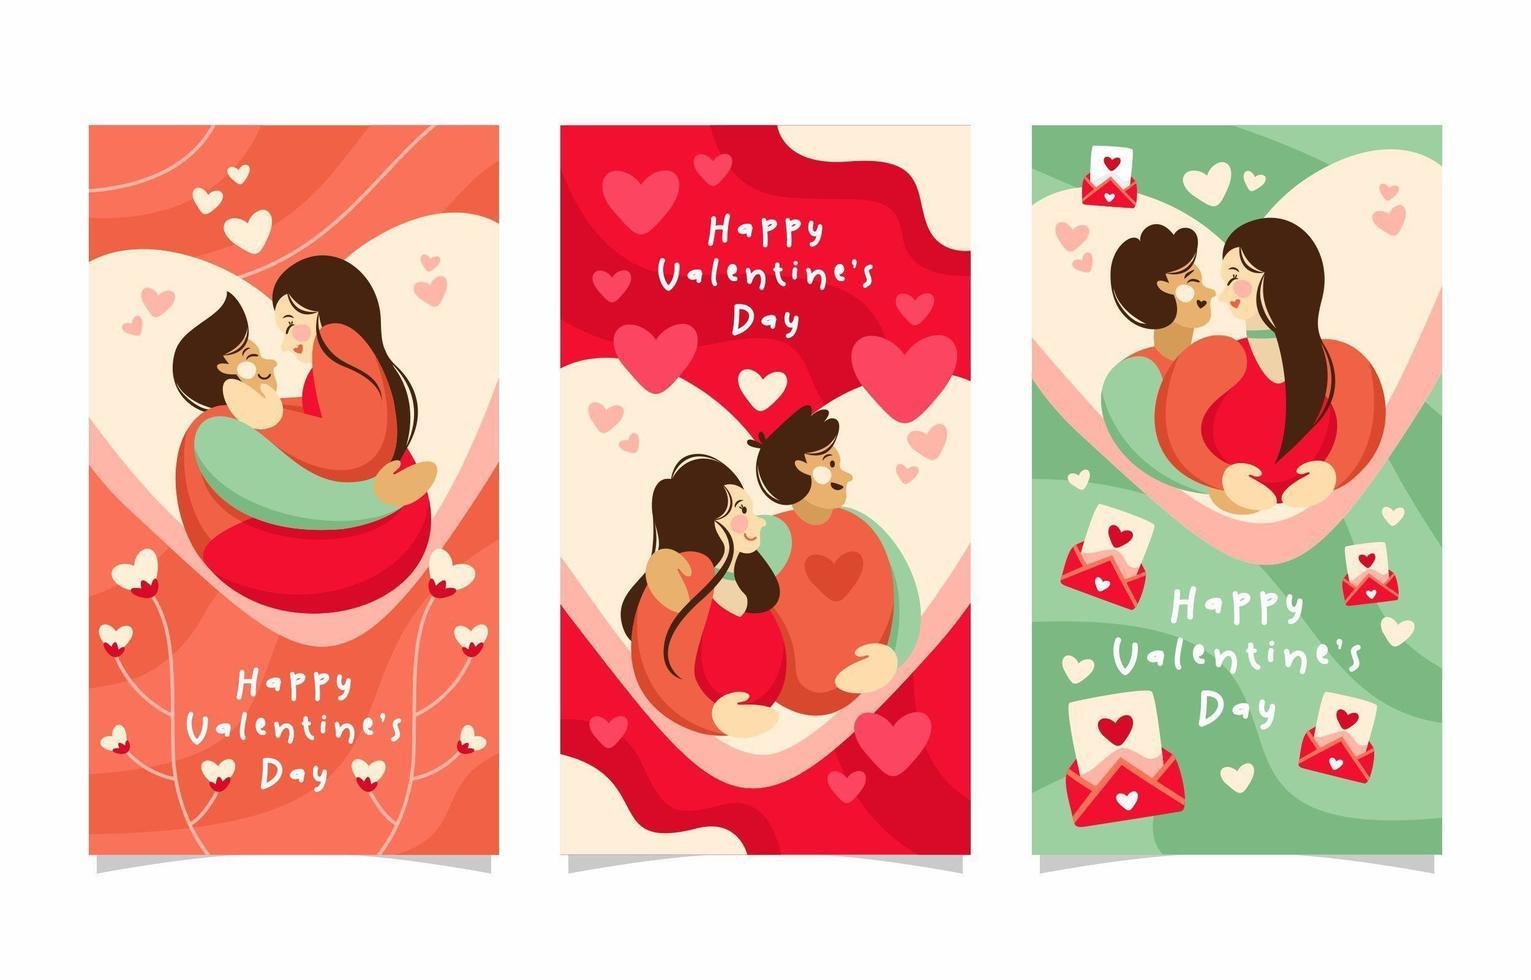 romantische Valentijnsdag banner vector